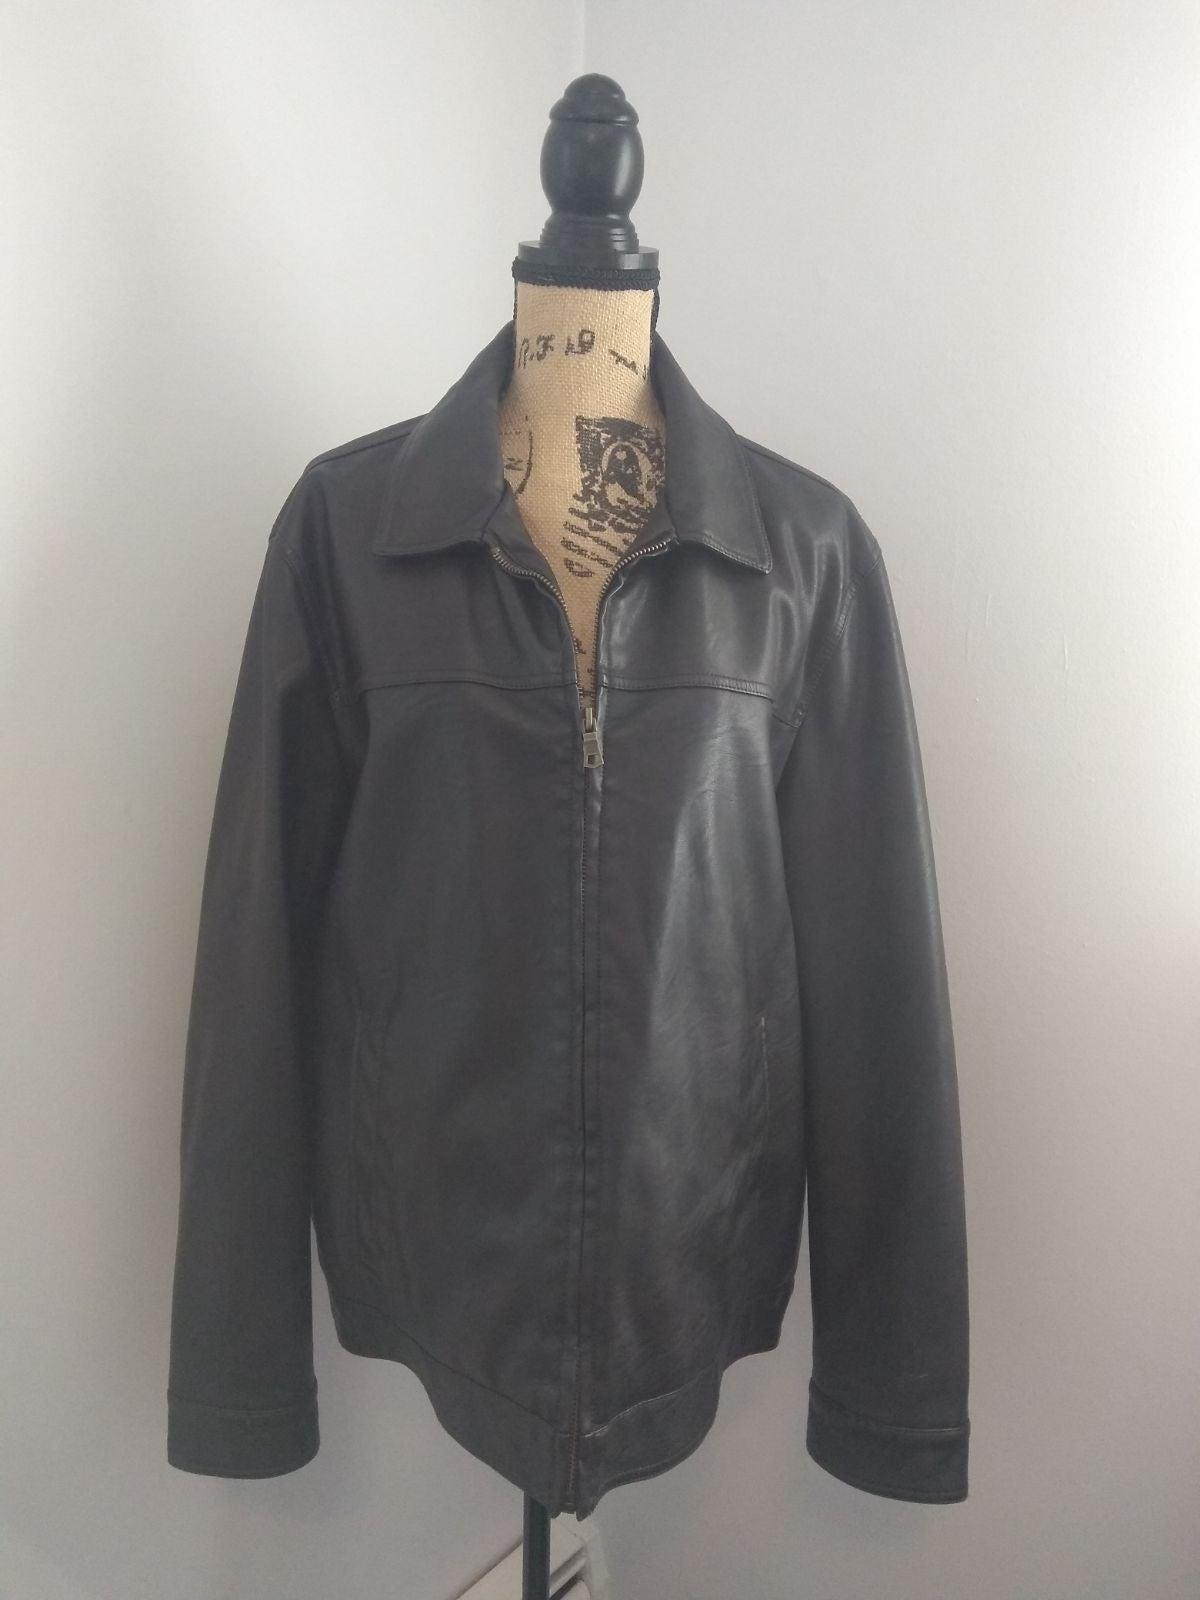 Tommy Hilfiger Leather Look Jacket, Size